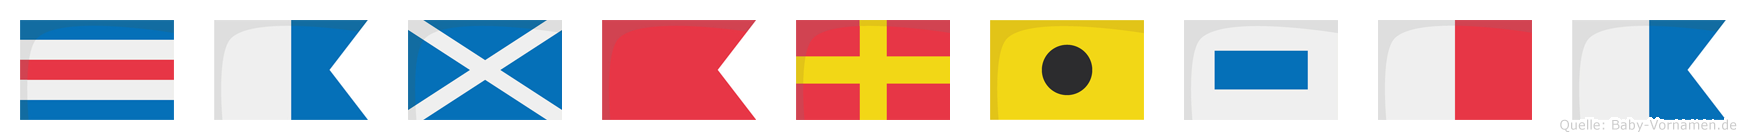 Cambrisha im Flaggenalphabet